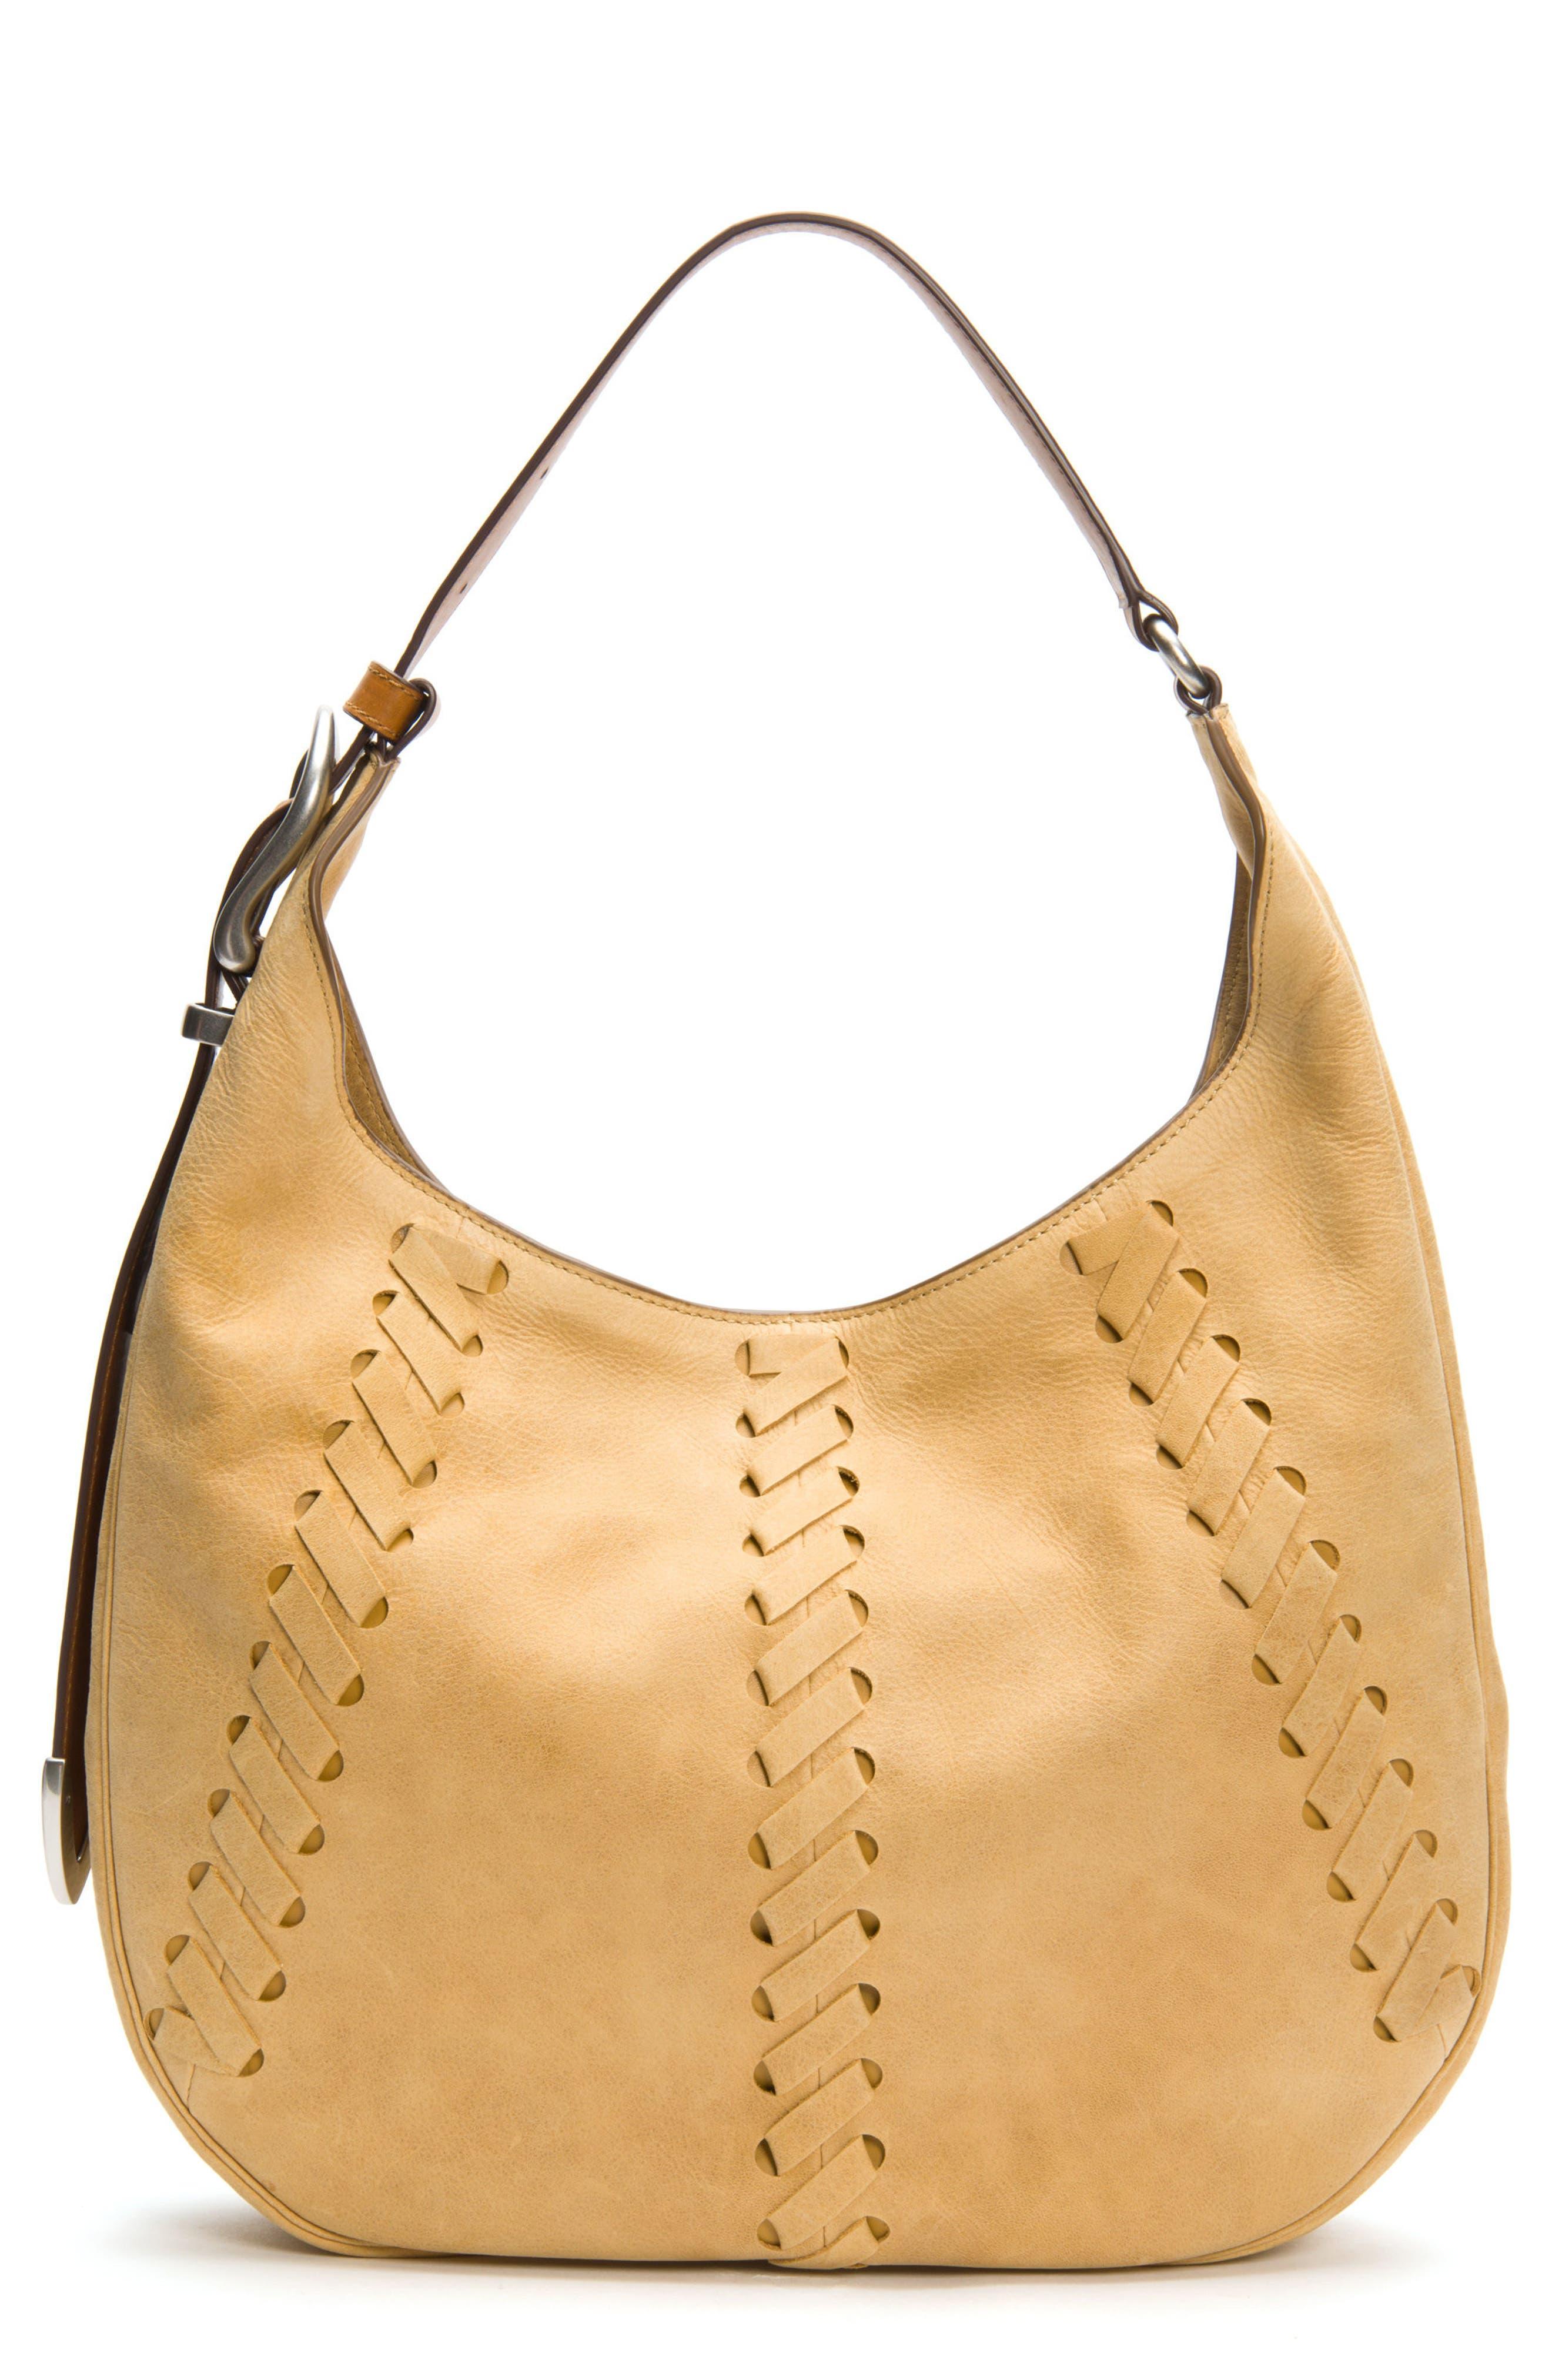 Frye Jacqui Whipstitch Leather Hobo